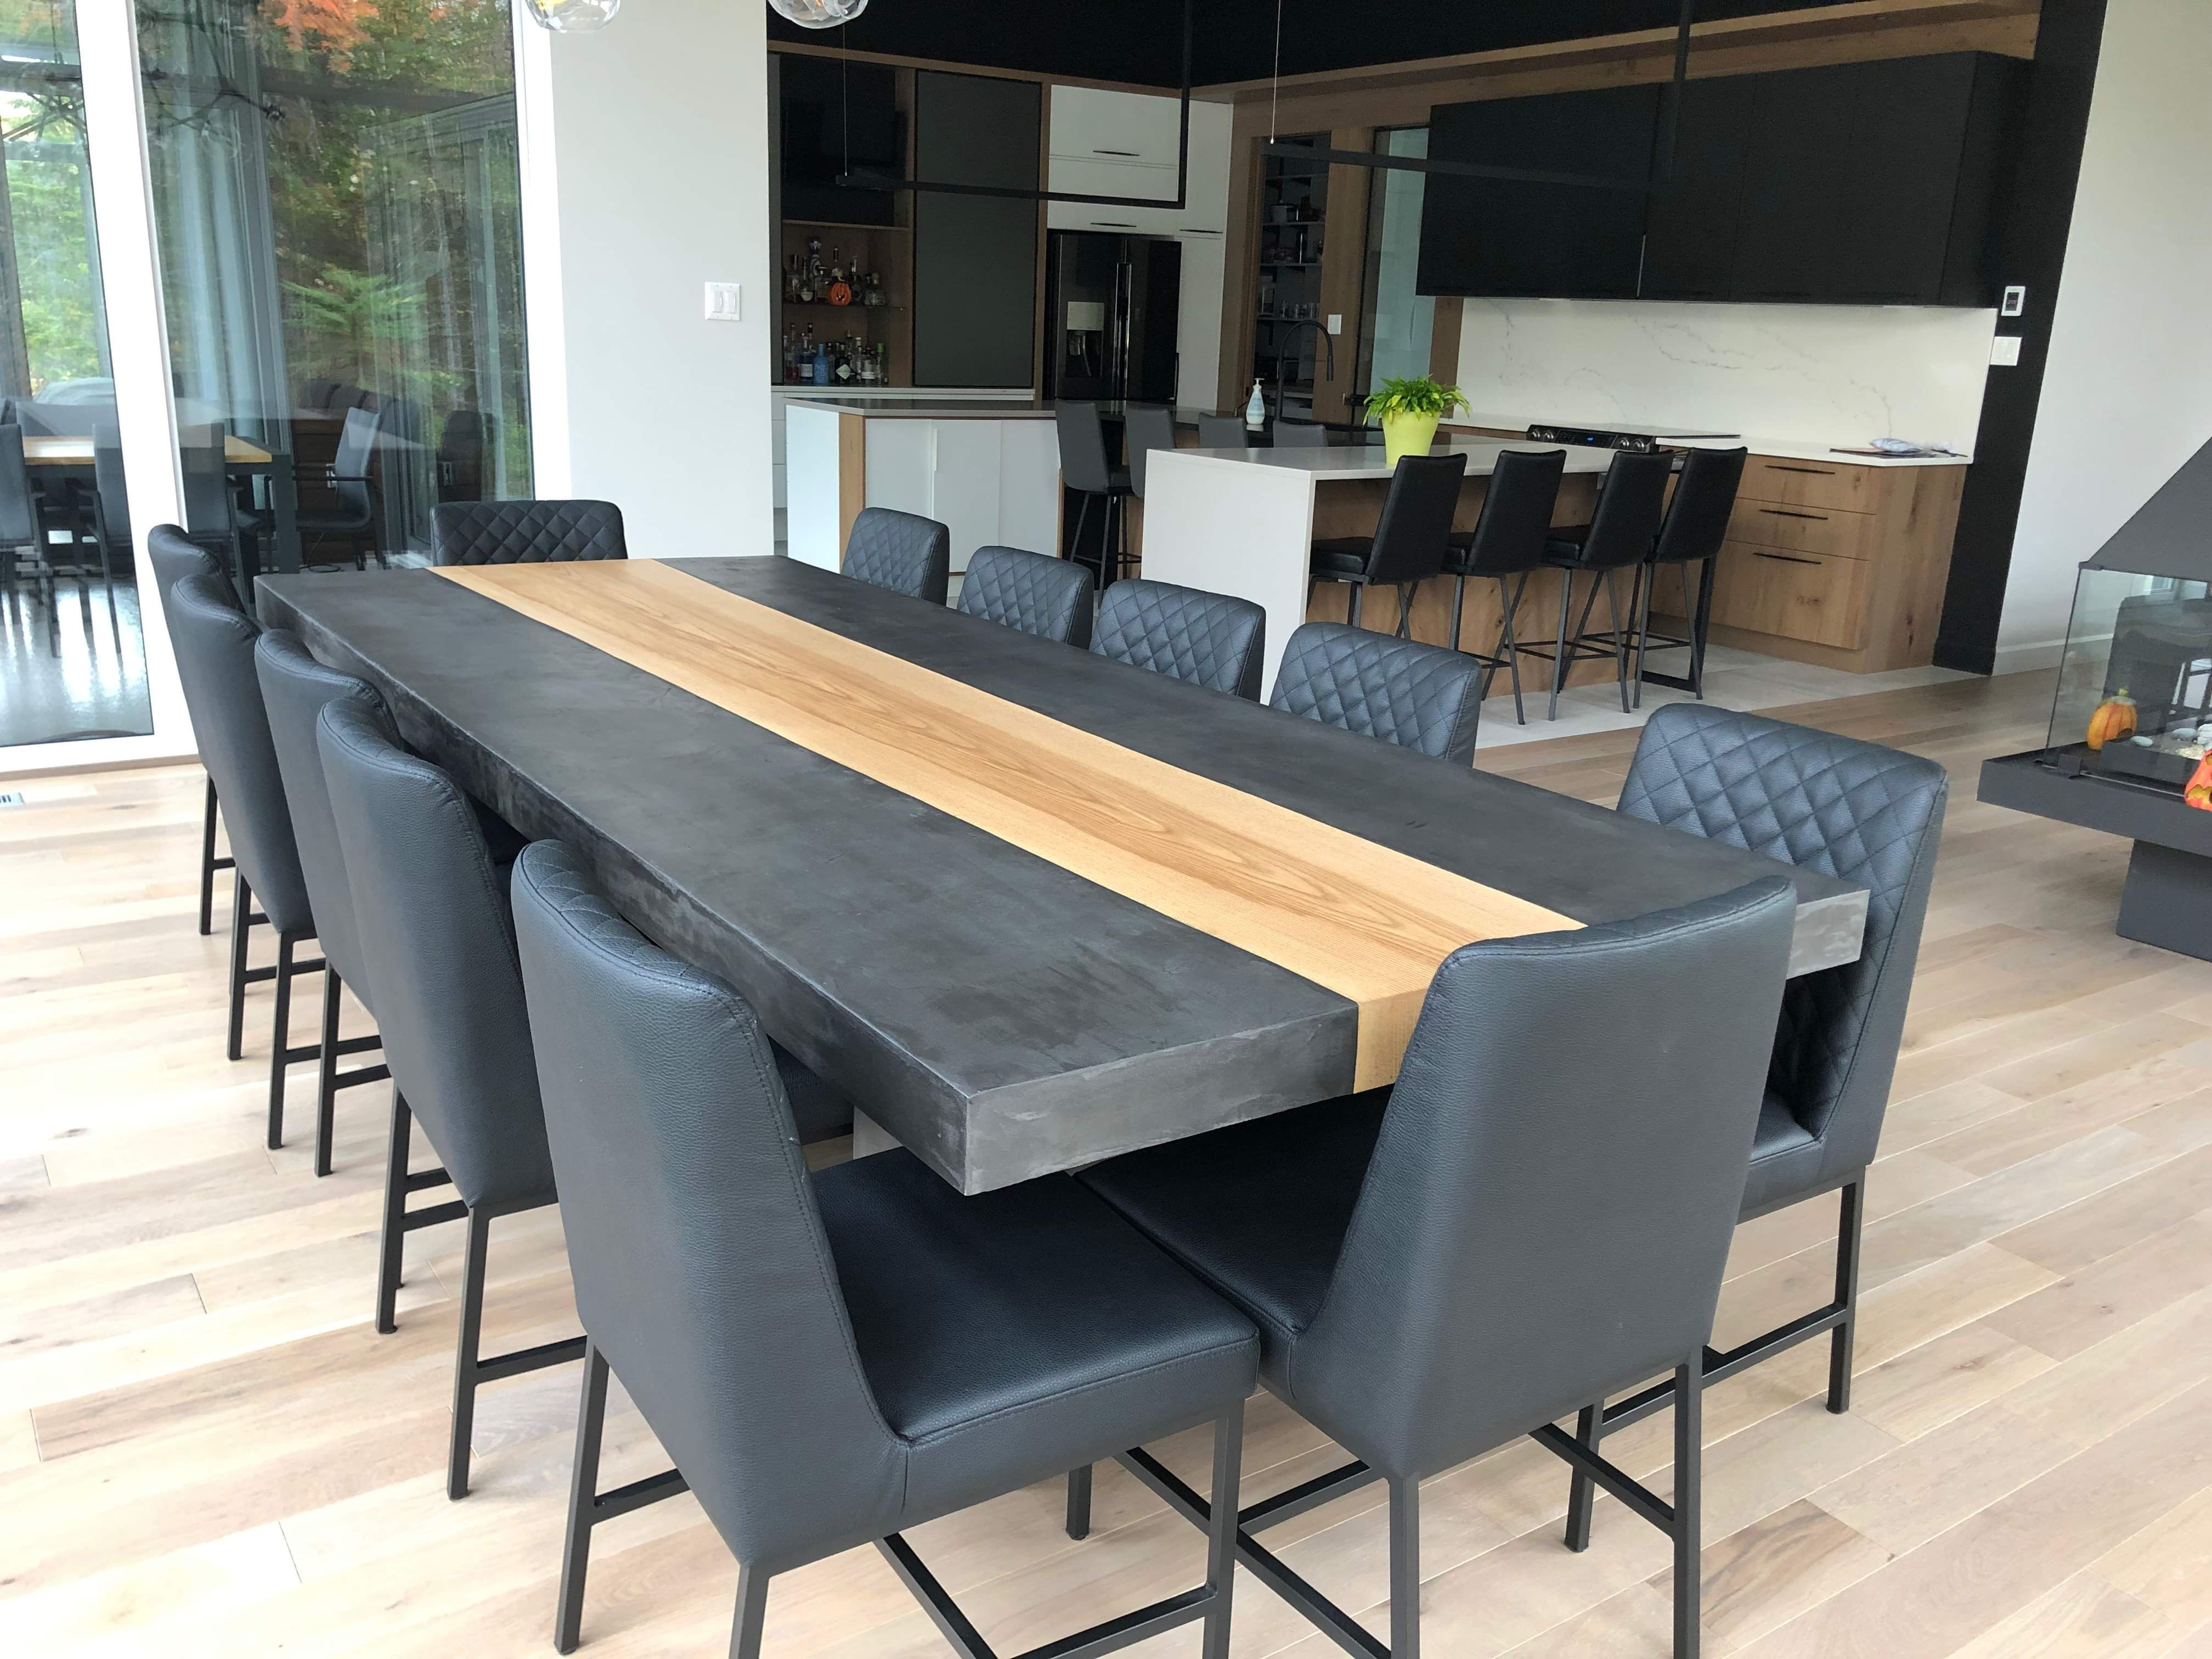 Table Kenogami Beton Onyx Frene Ambree 120 Lo X 48 La 3 1 2 Epais Chaises Marvin Cu009 5 Surmesure Lusine Tabl Dining Table Table Home Decor